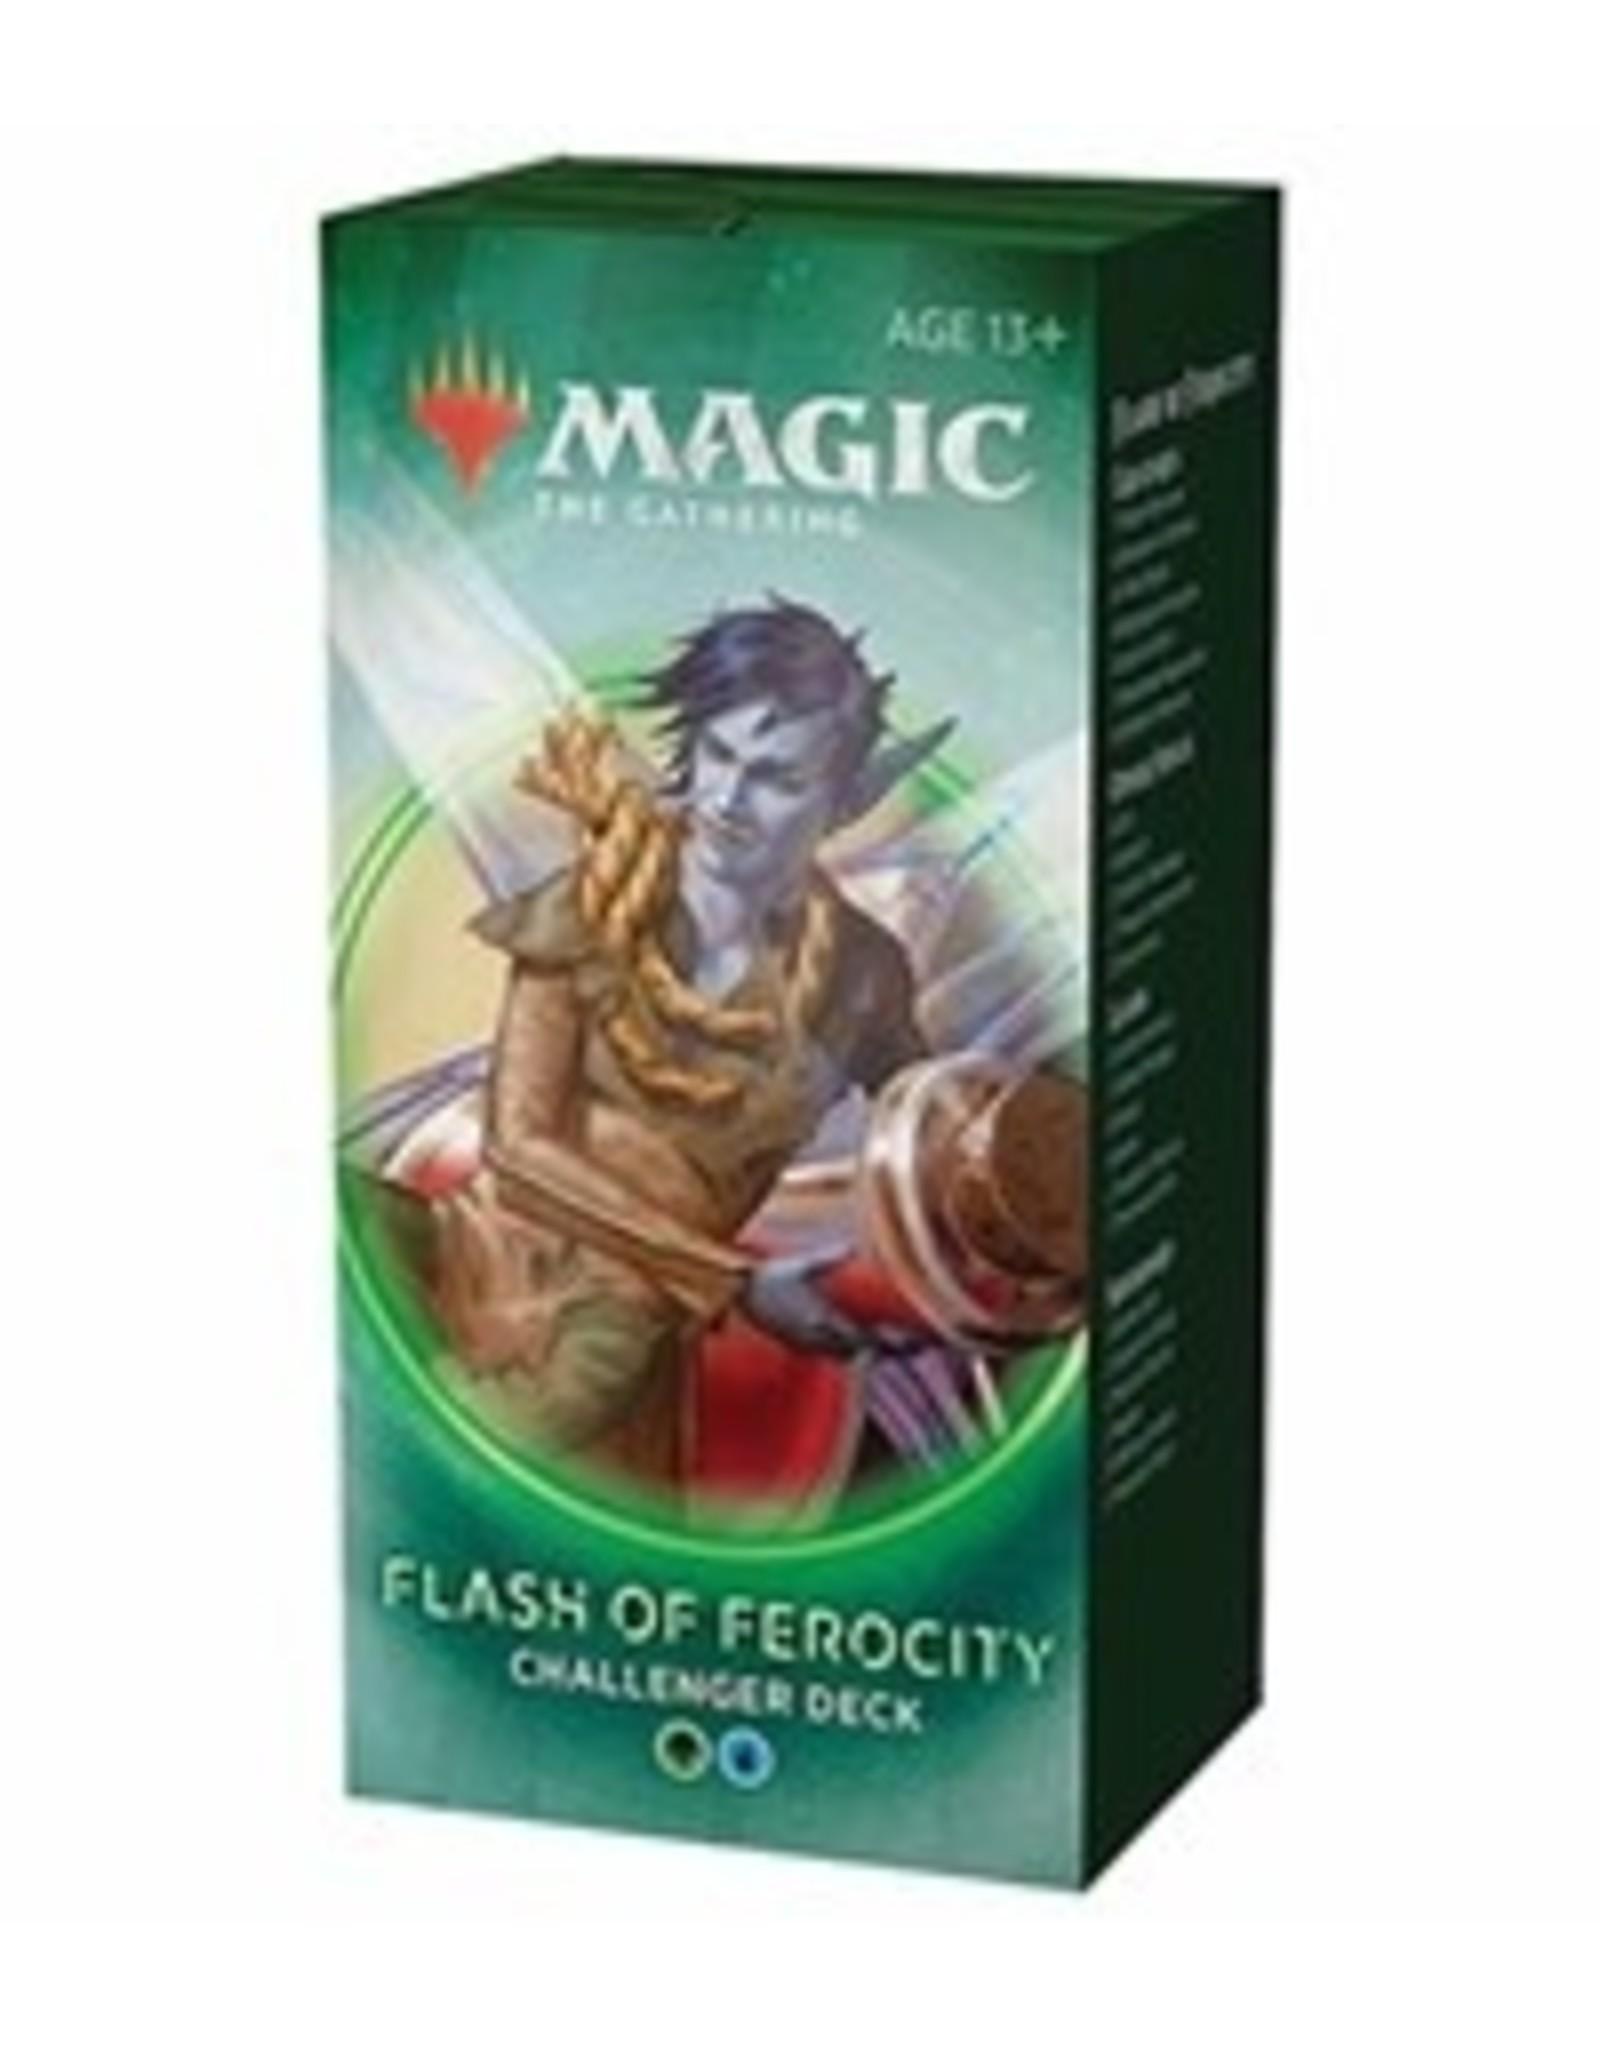 Wizards of the Coast MTG: Challenger Deck 2020: Flash of Ferocity